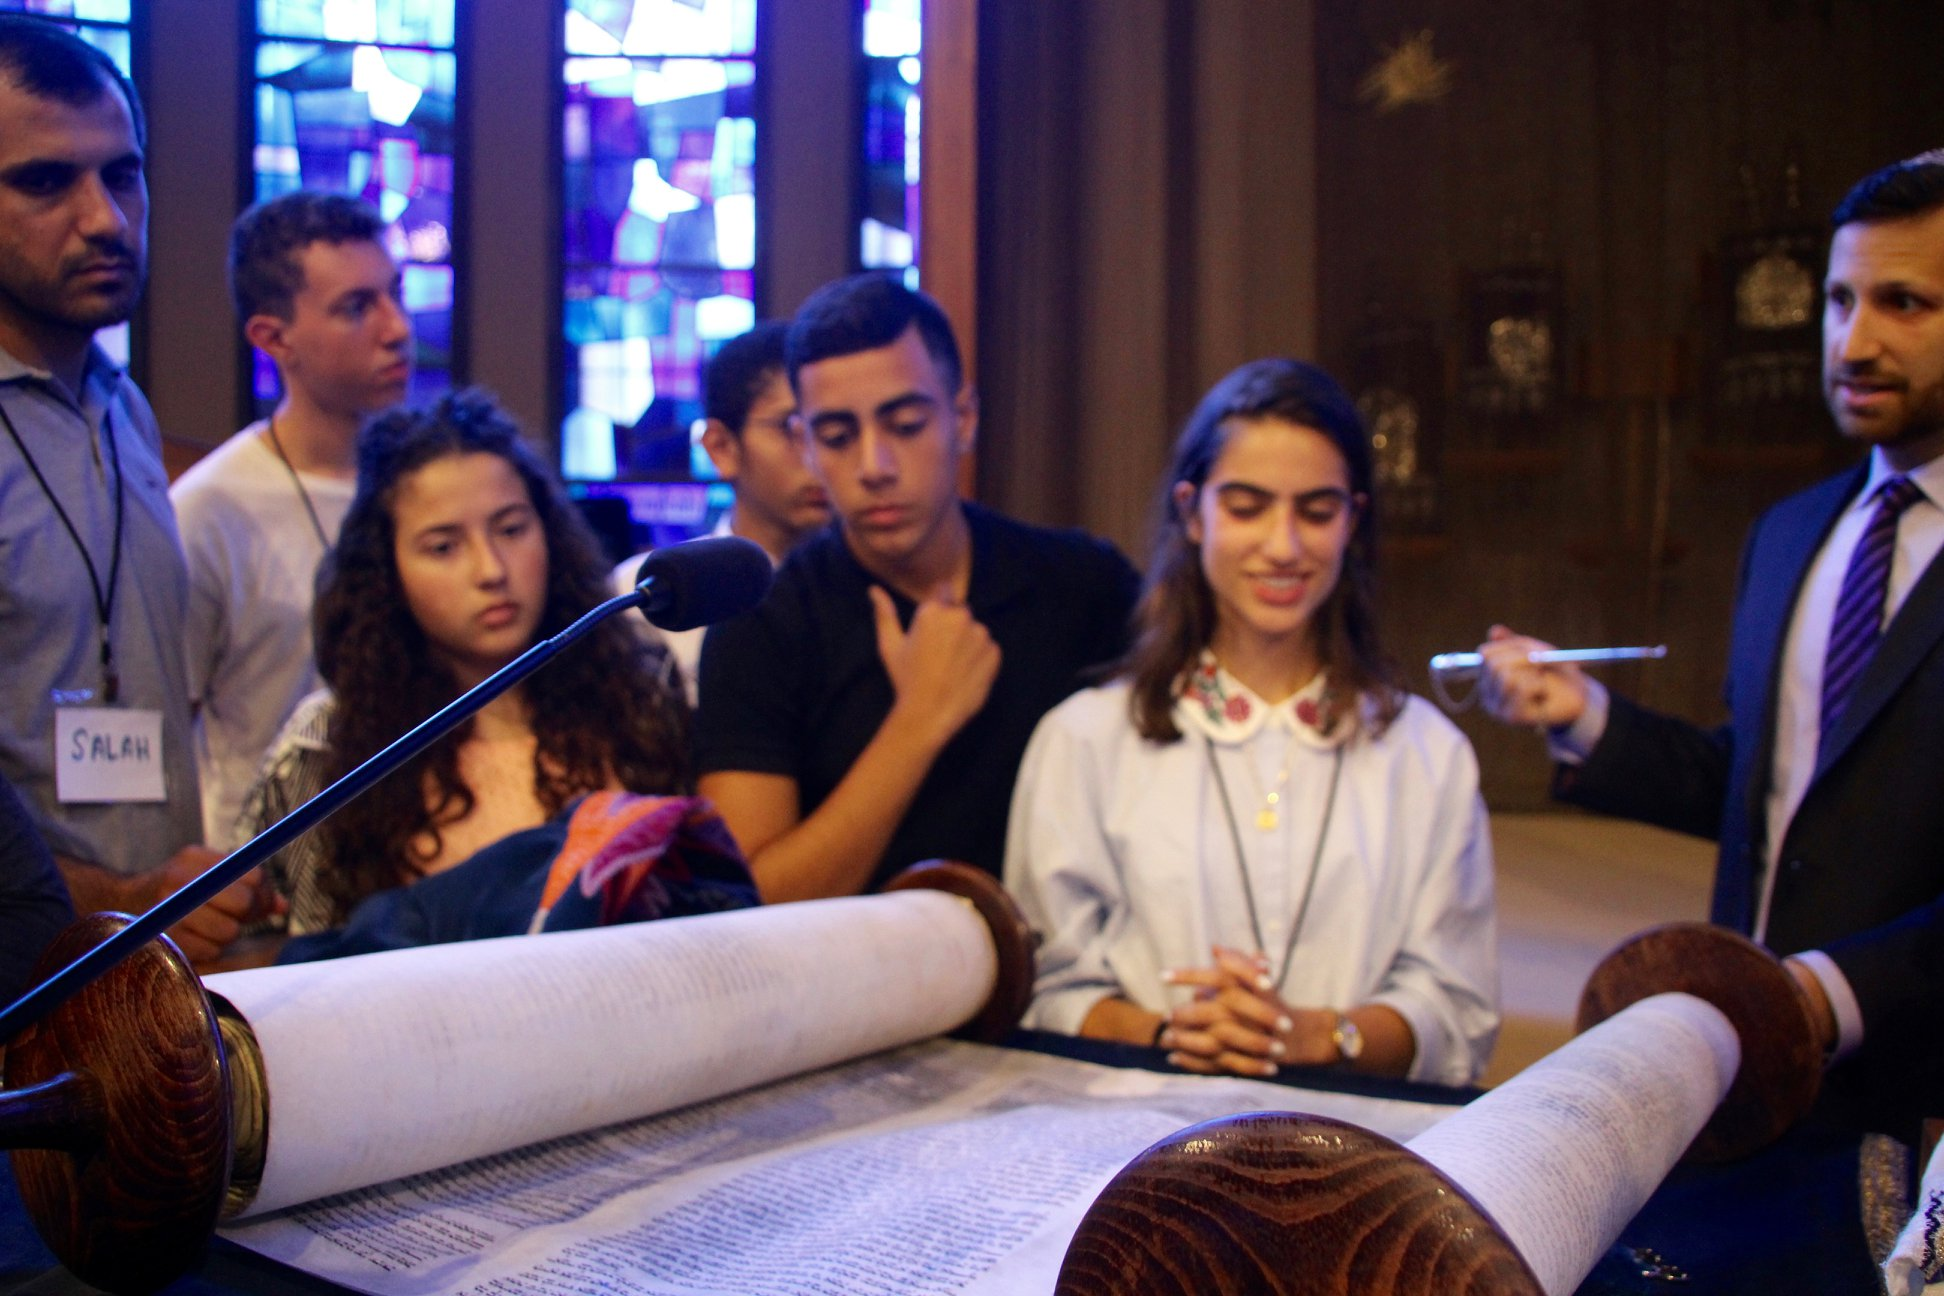 Torah scroll reading on service